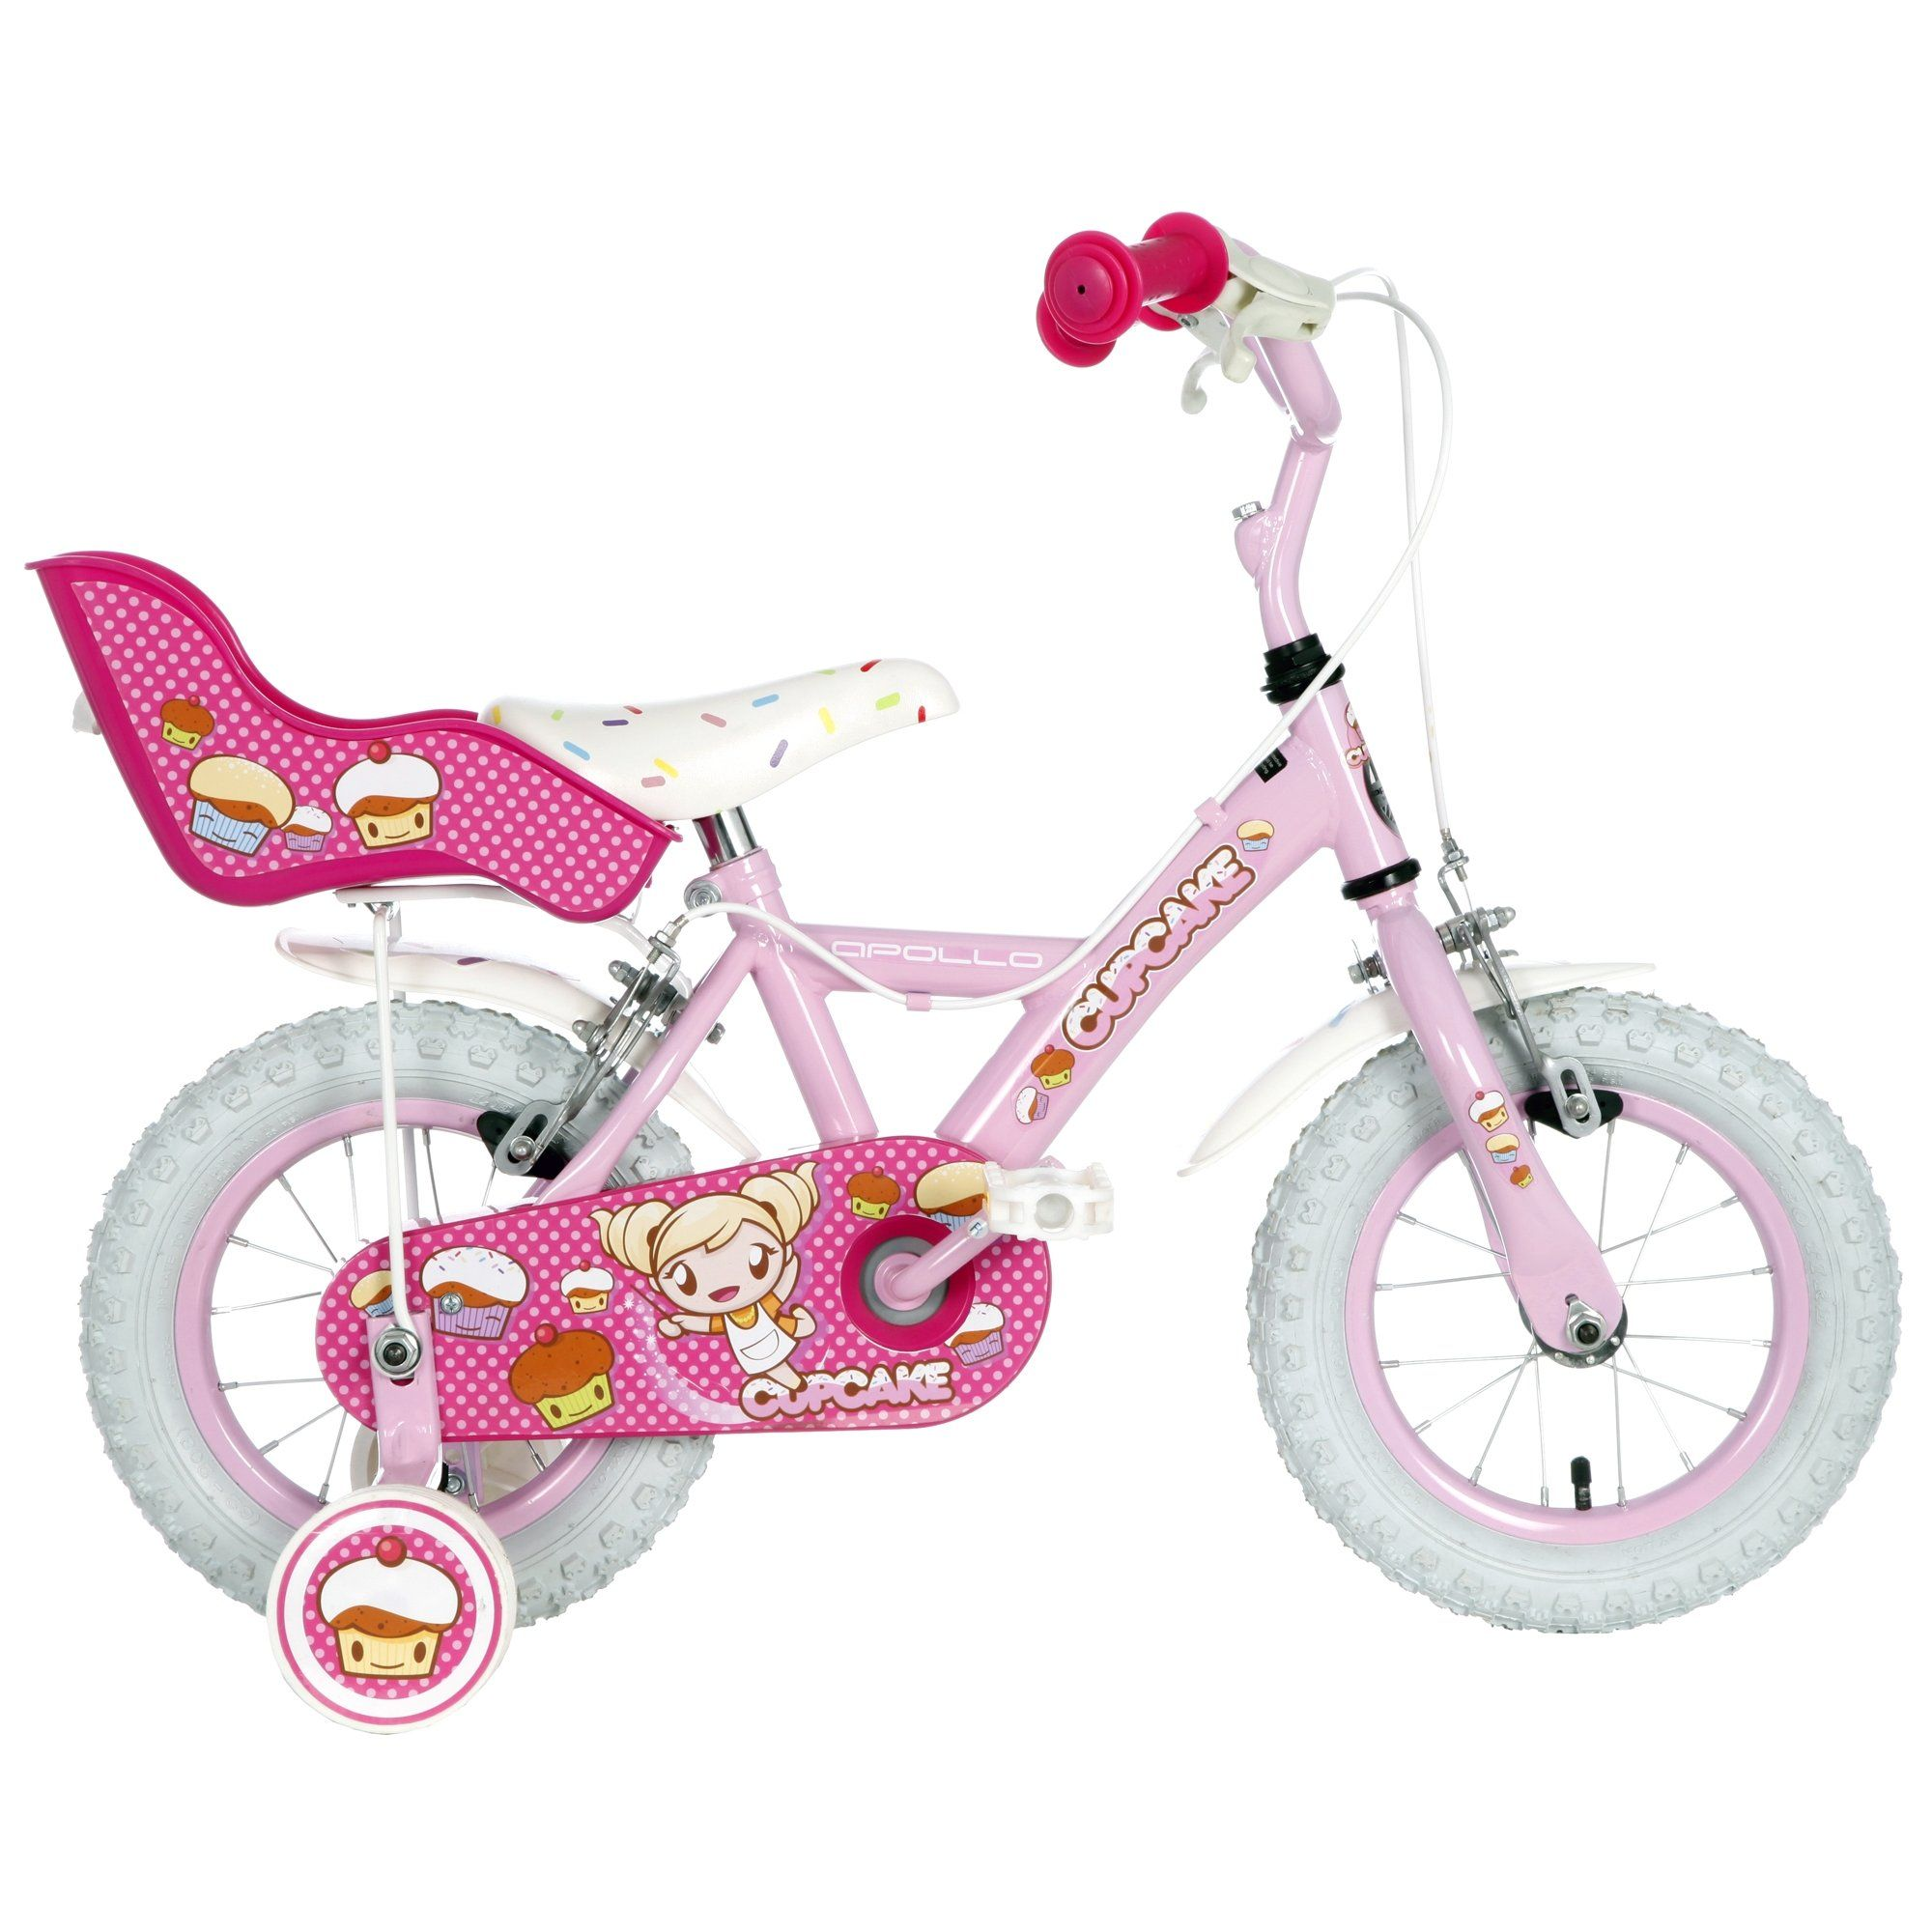 3c602bc9645 Halfords | Apollo Cupcake Girls Bike - 12